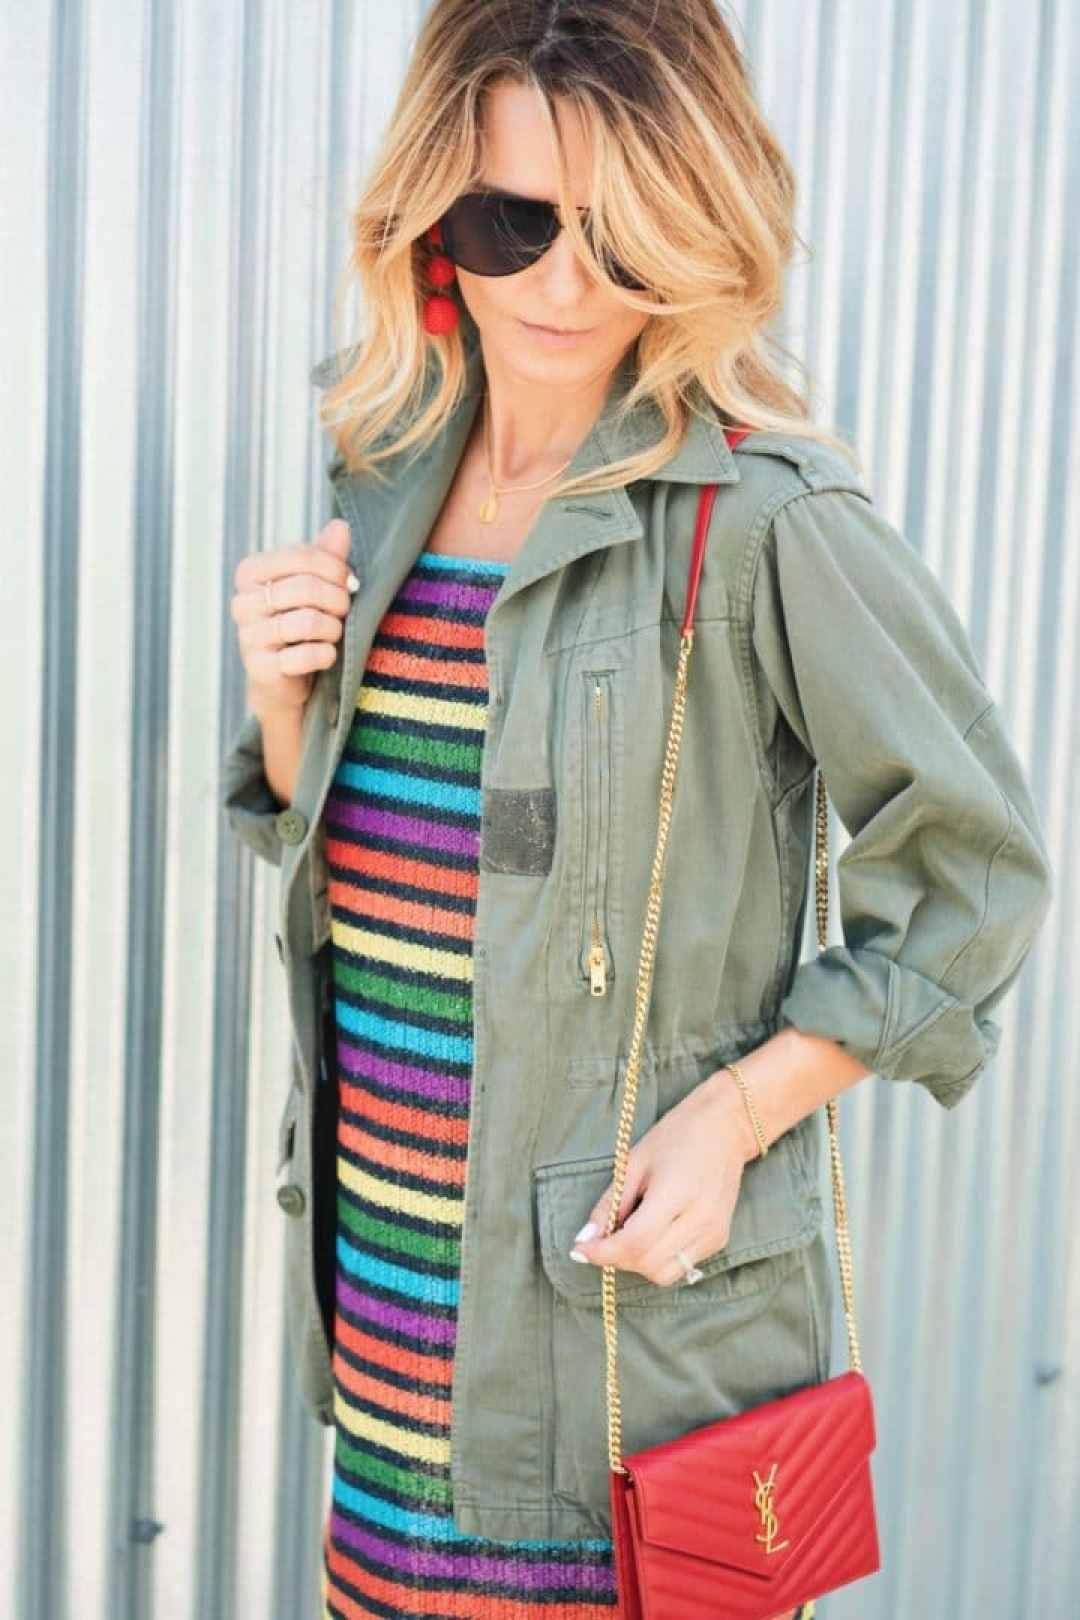 Rainbow Print Dress with Green Army Jacket